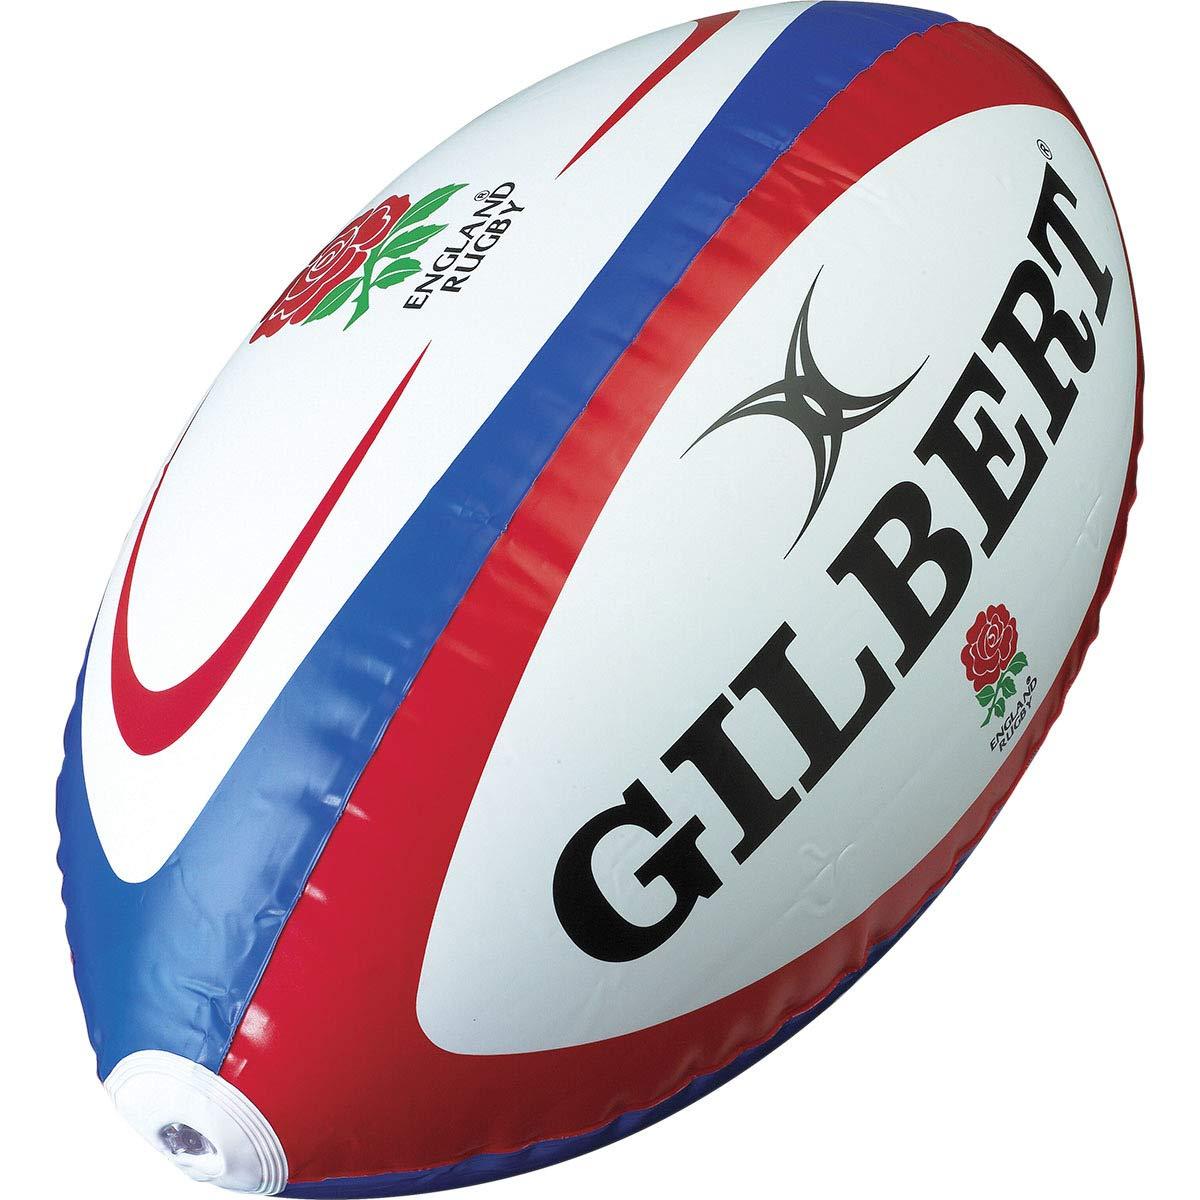 Gilbert Ballon England Ball INFL 14 Giant